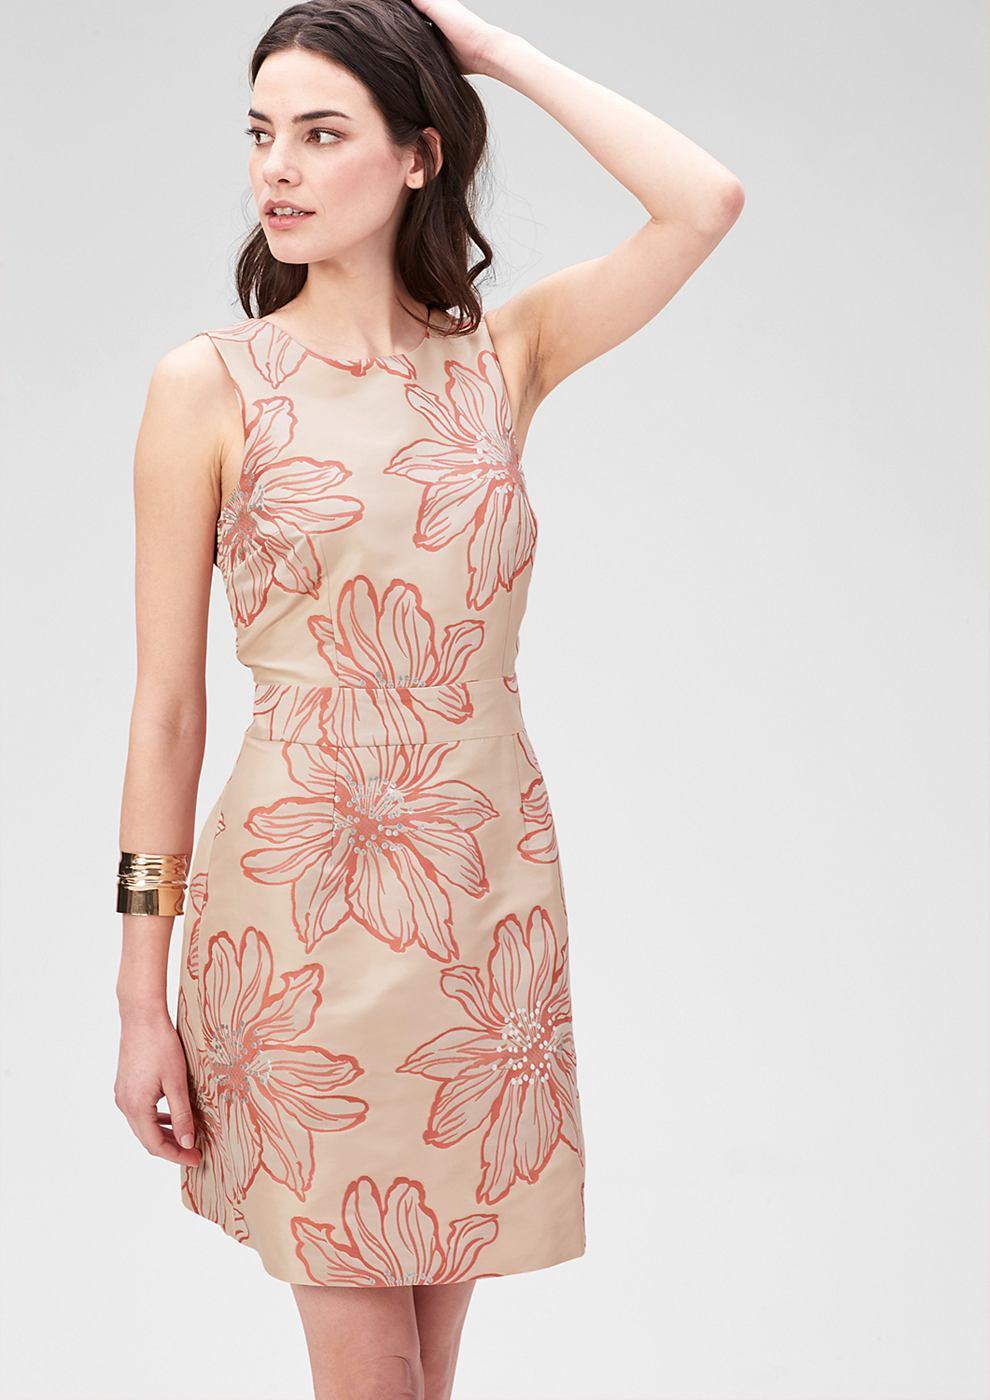 s.Oliver Premium Getailleerde jacquard jurk roze